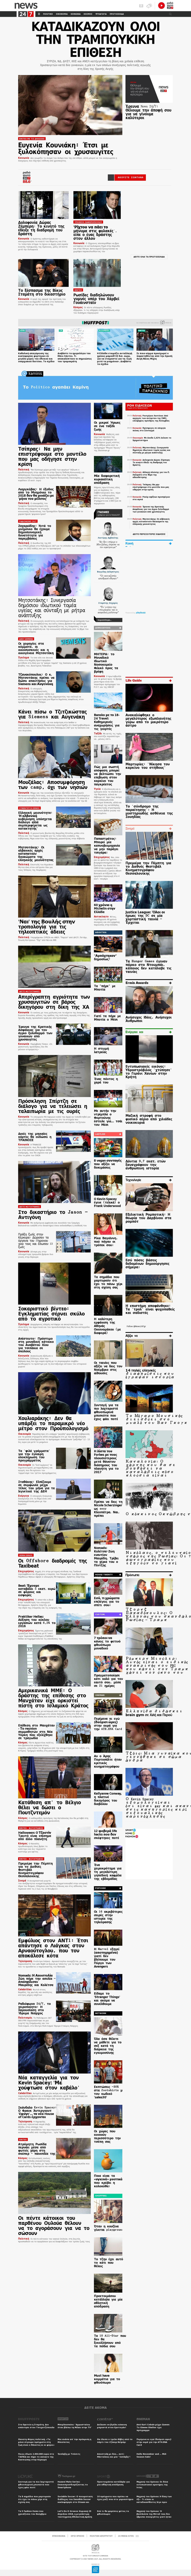 News 247 at Wednesday Nov. 1, 2017, 7:13 p.m. UTC